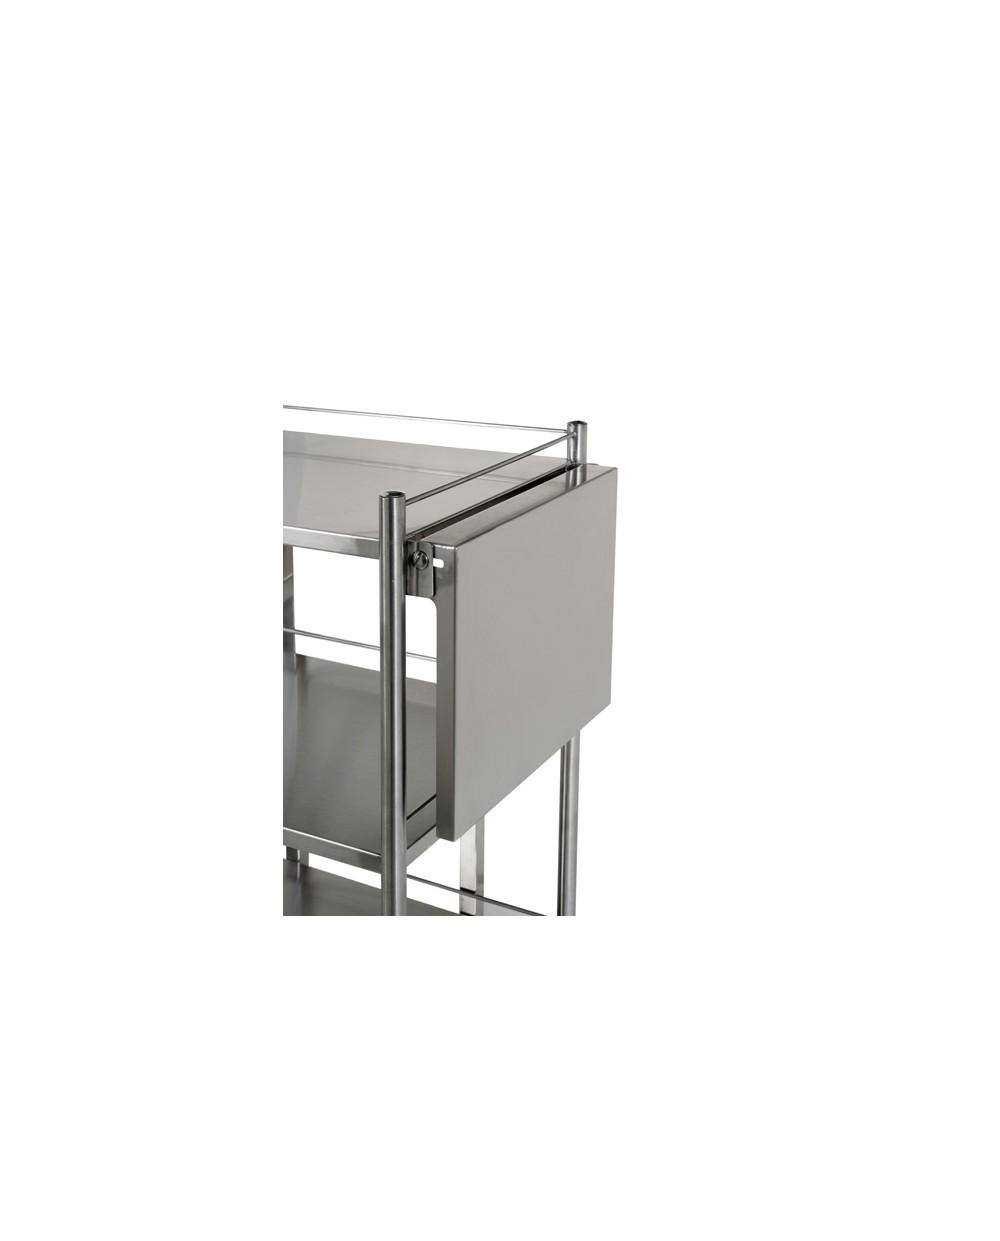 tablette rabattable pour gu ridon inox villard. Black Bedroom Furniture Sets. Home Design Ideas